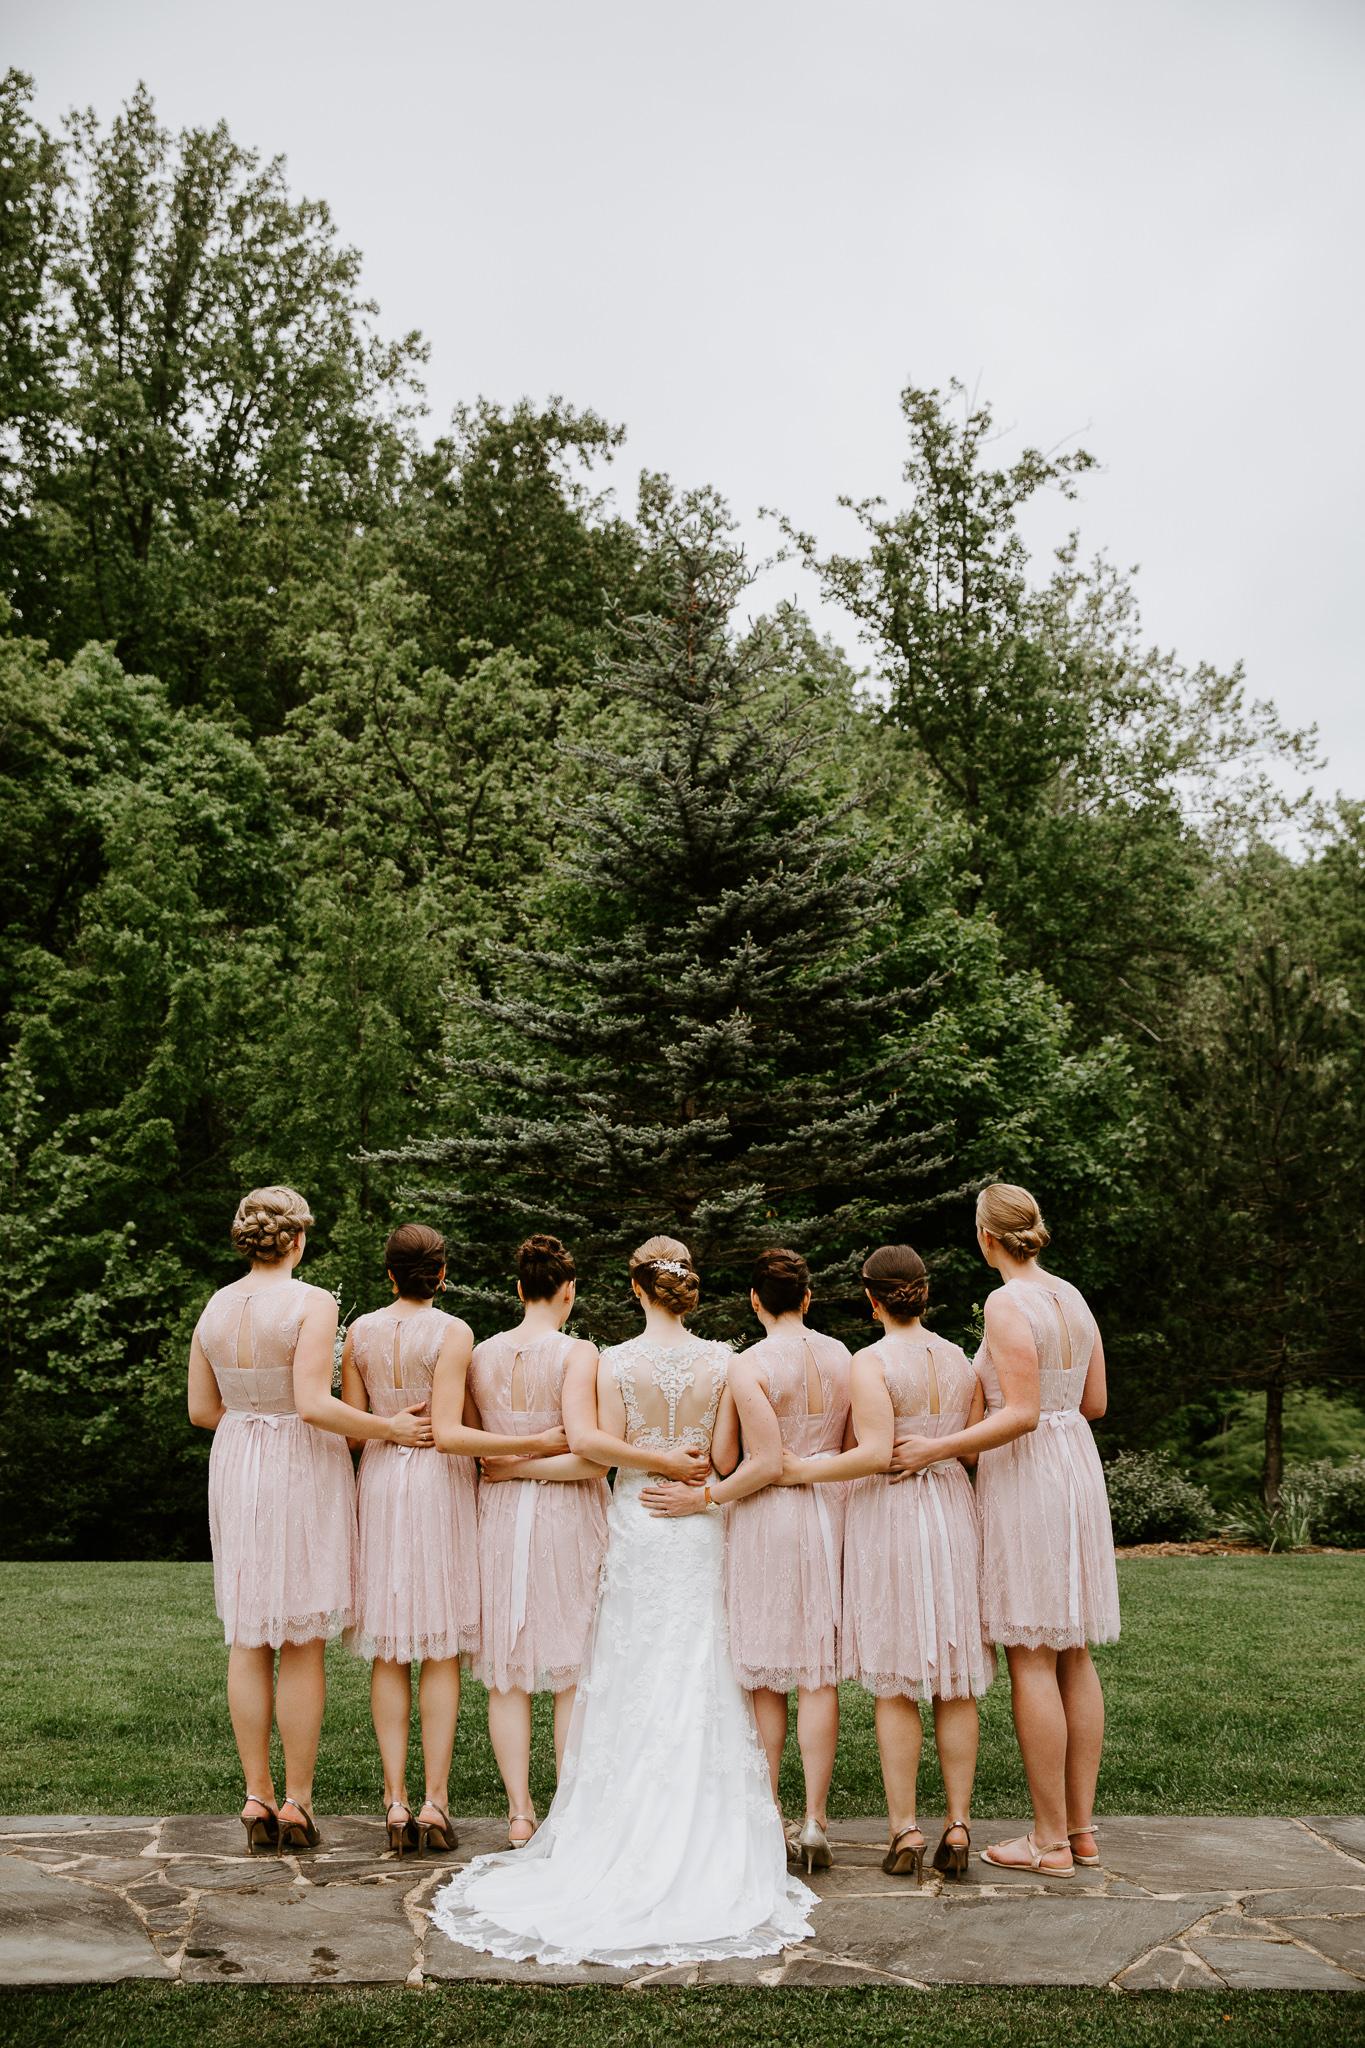 House Mountain Inn - Weddings - Lexington - Virginia - Best Wedding Photographer - Pat Cori Photography-40.jpg